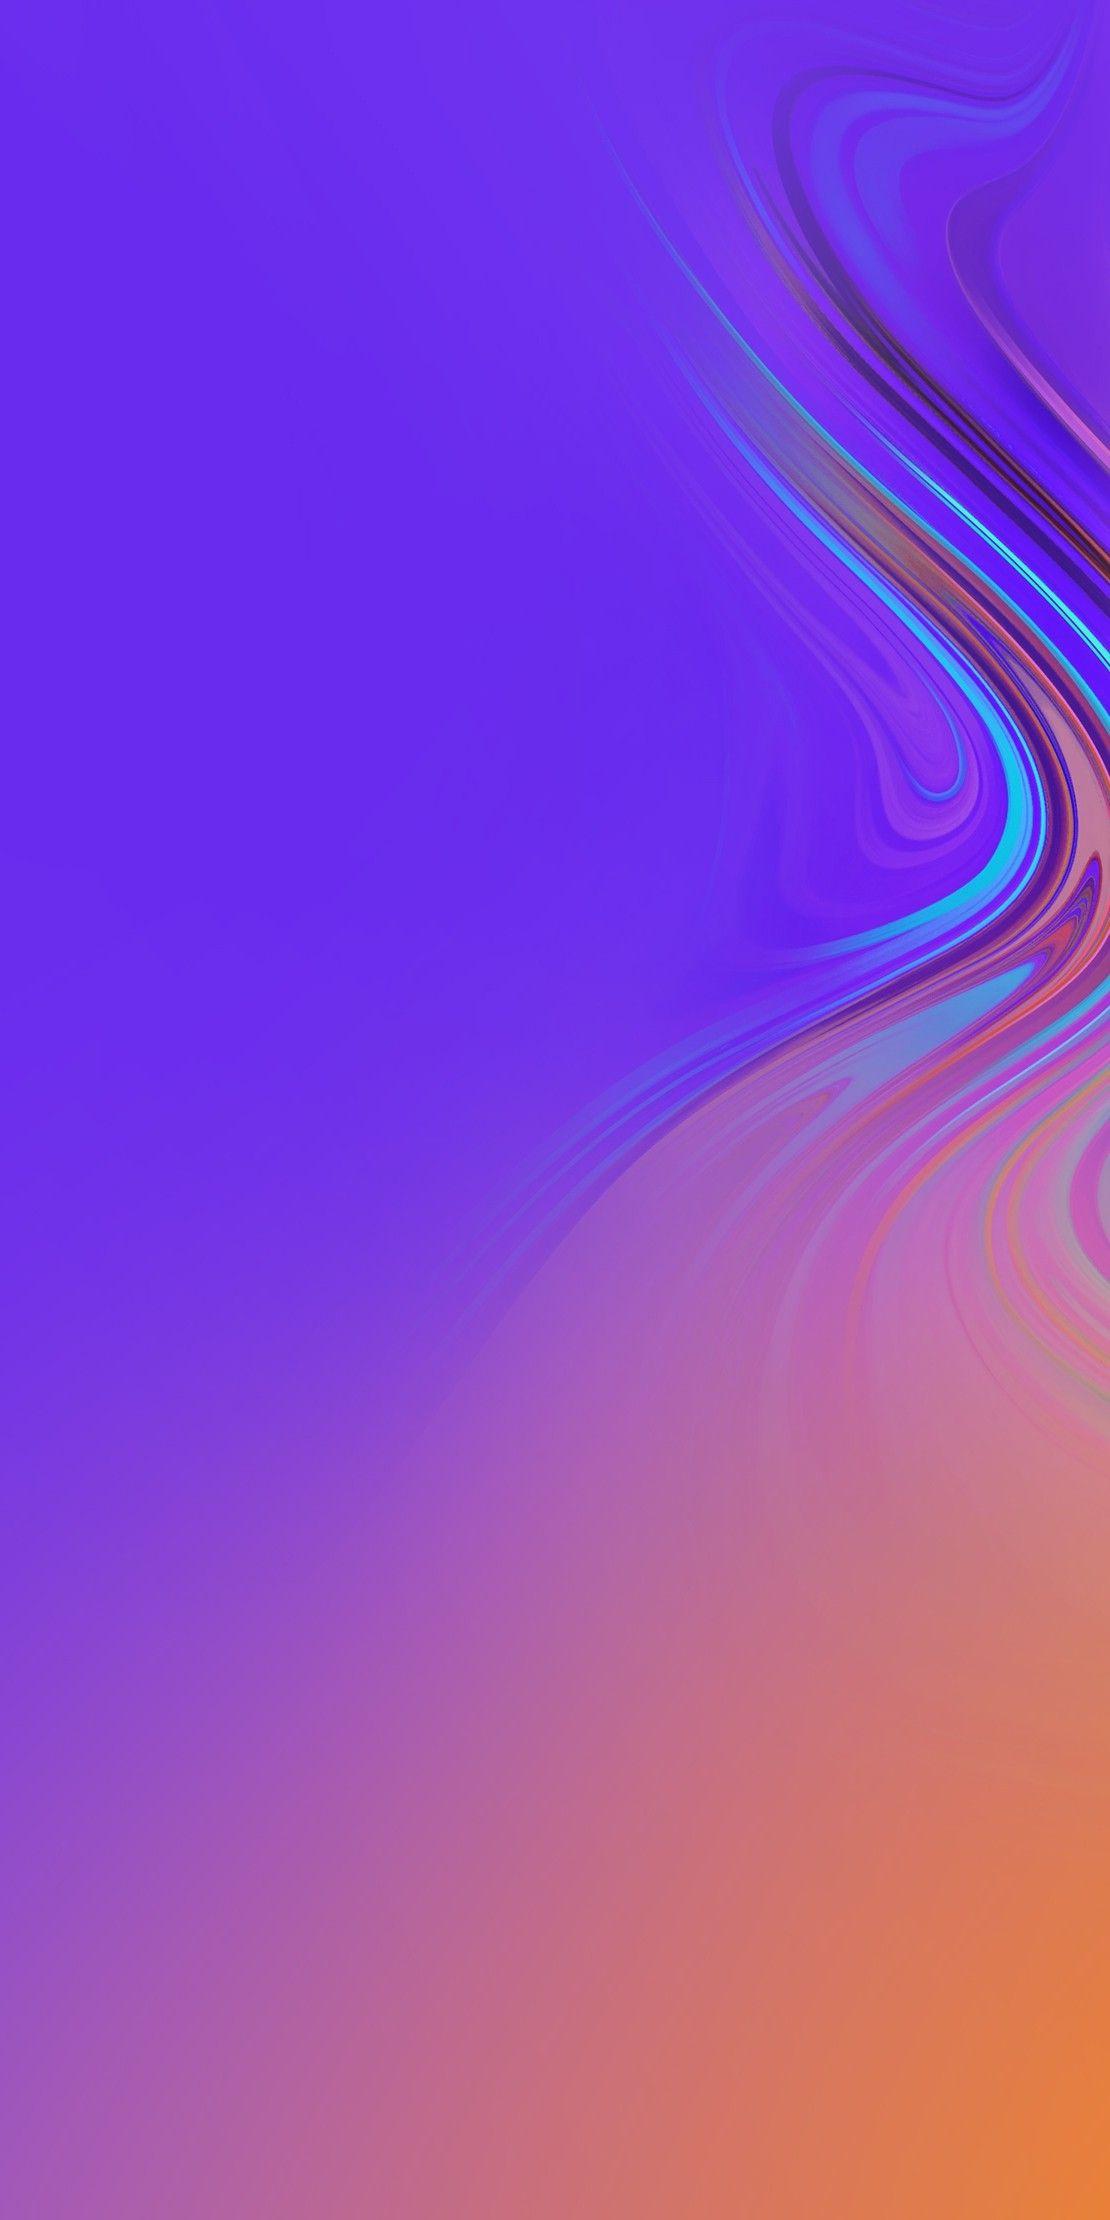 Pin By Iyan Sofyan On Abstract Amoled Liquid Gradient Samsung Galaxy Wallpaper Phone Screen Wallpaper Abstract Wallpaper Backgrounds